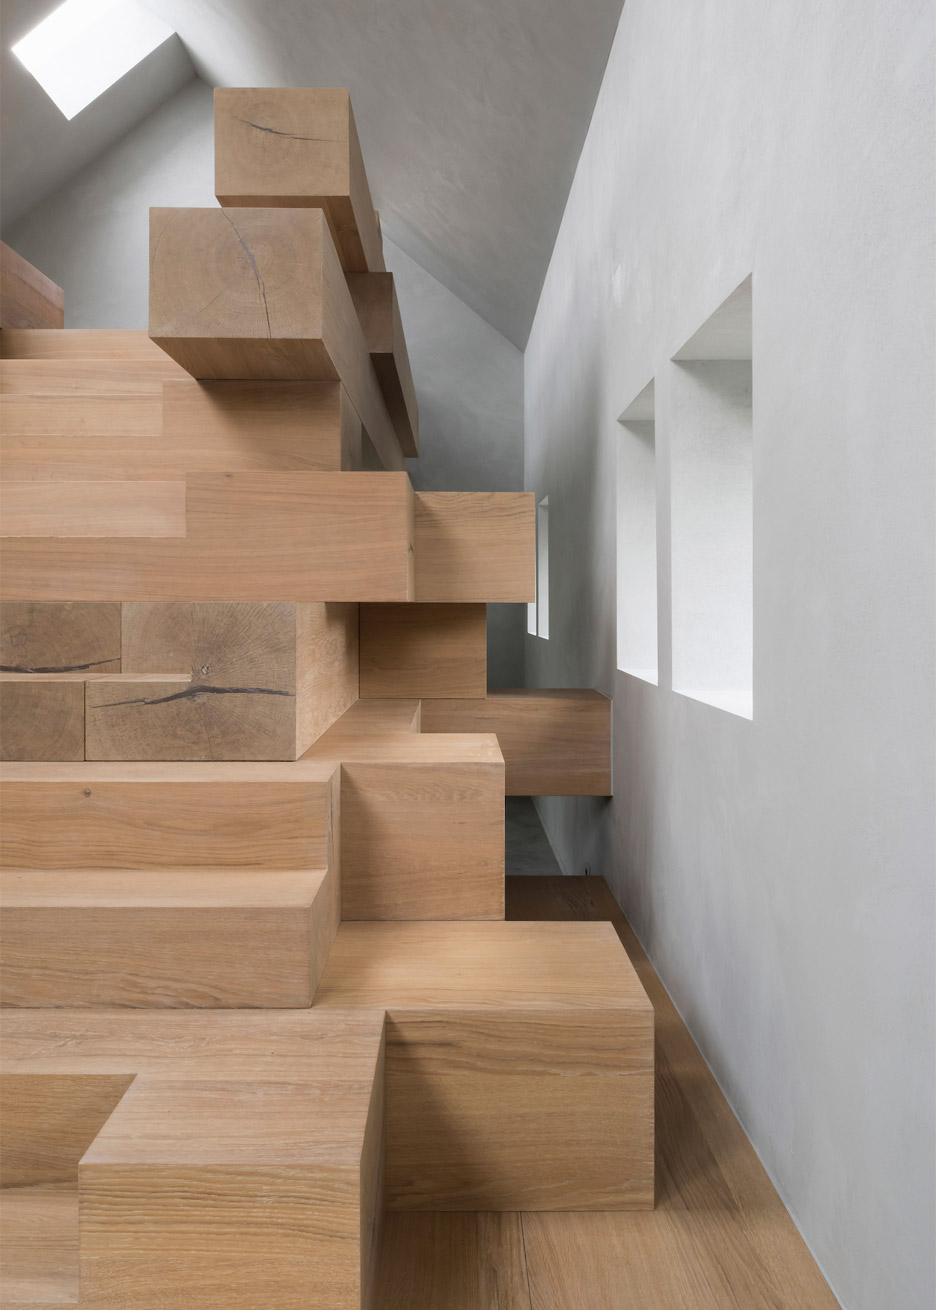 architecture_wood_office_design_studia_interiors_osnovadesign_osnova_poltava_10